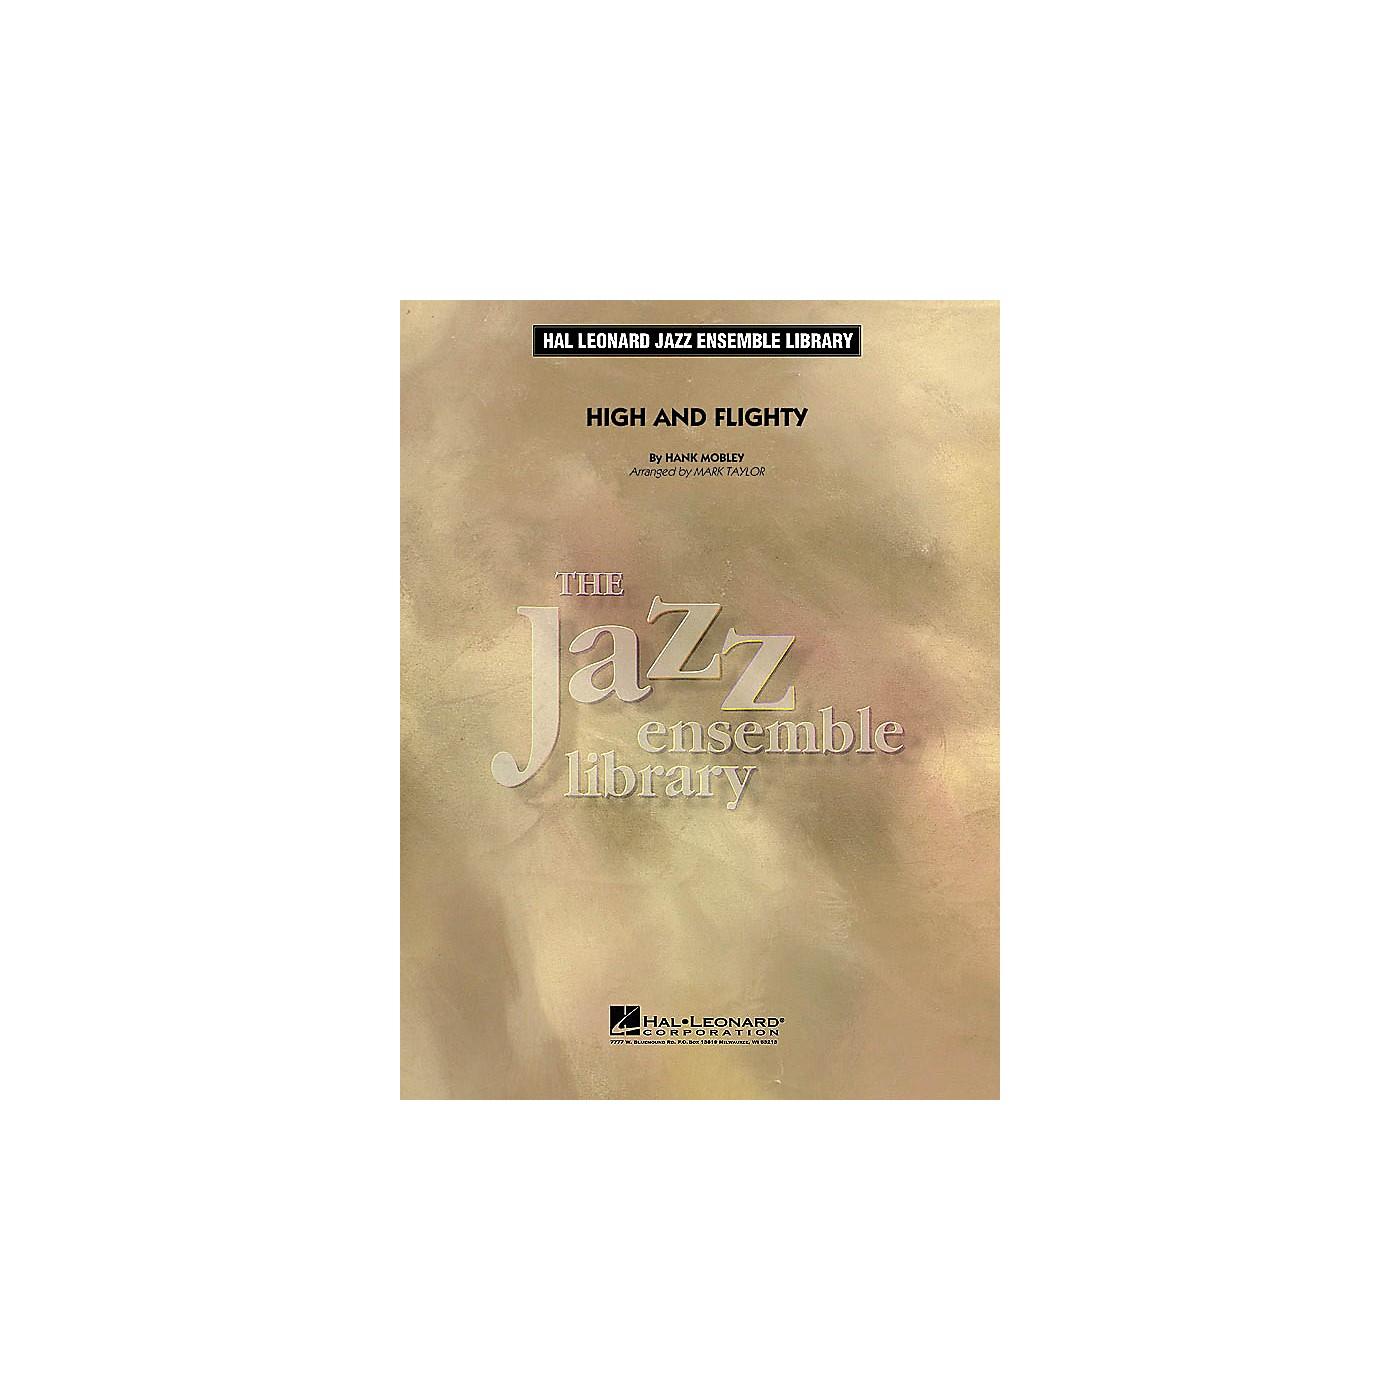 Hal Leonard High and Flighty Jazz Band Level 4 Arranged by Mark Taylor thumbnail